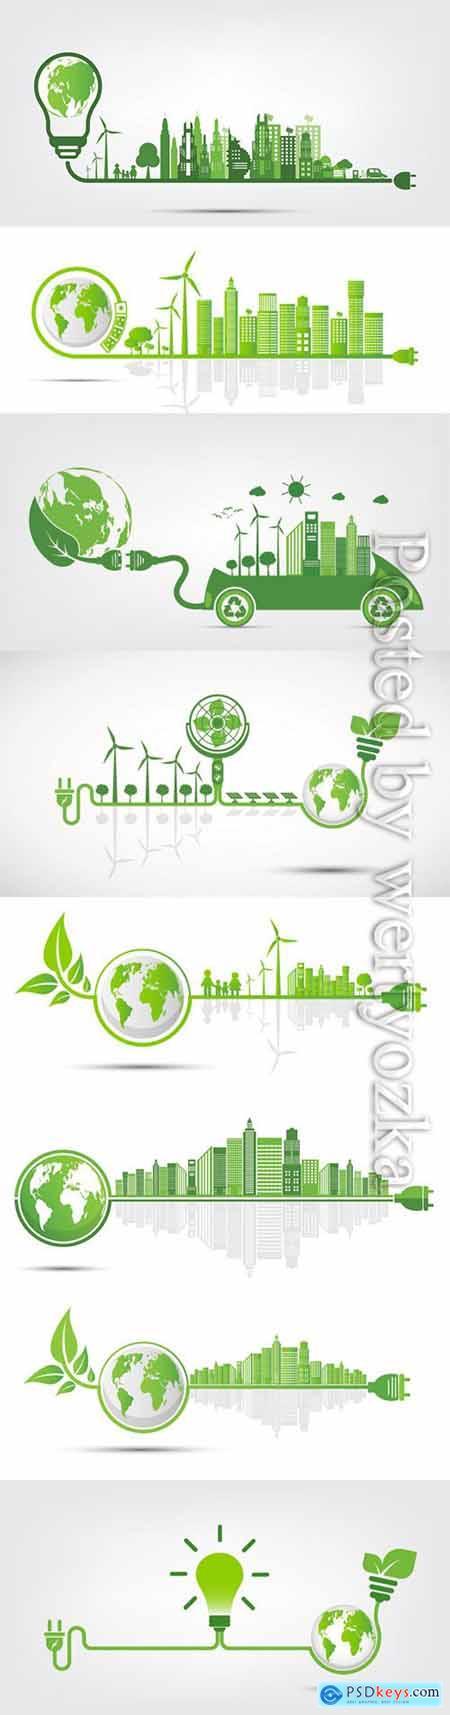 Ecology and Environmental vector concept